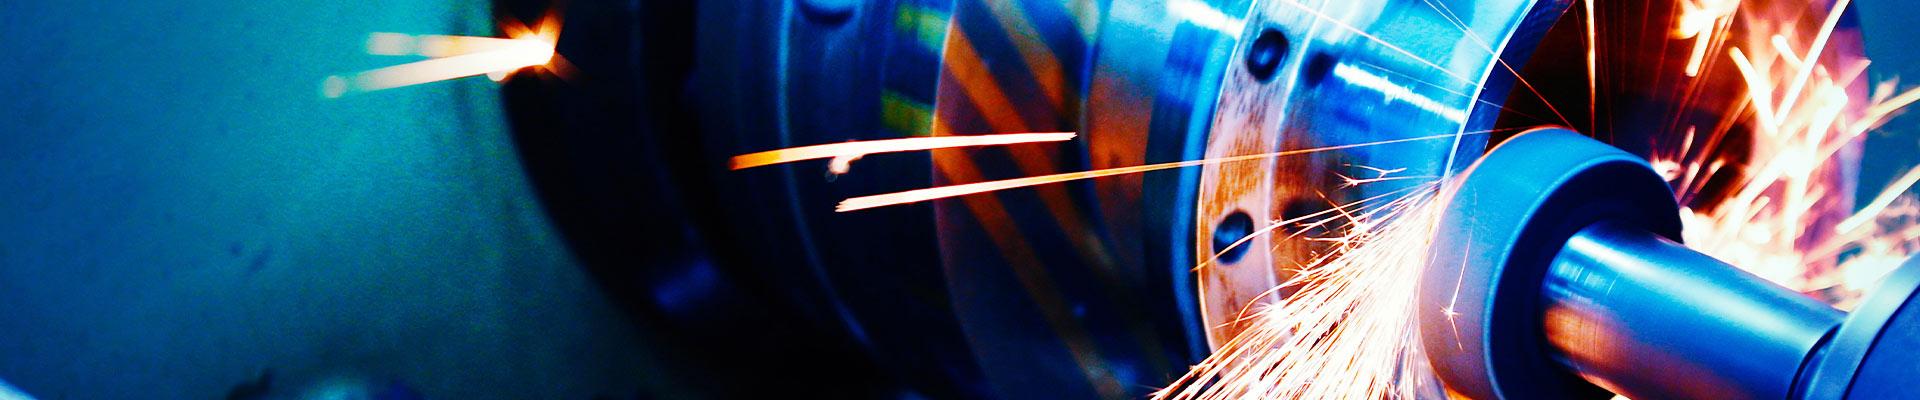 CNC Precision Milling Service